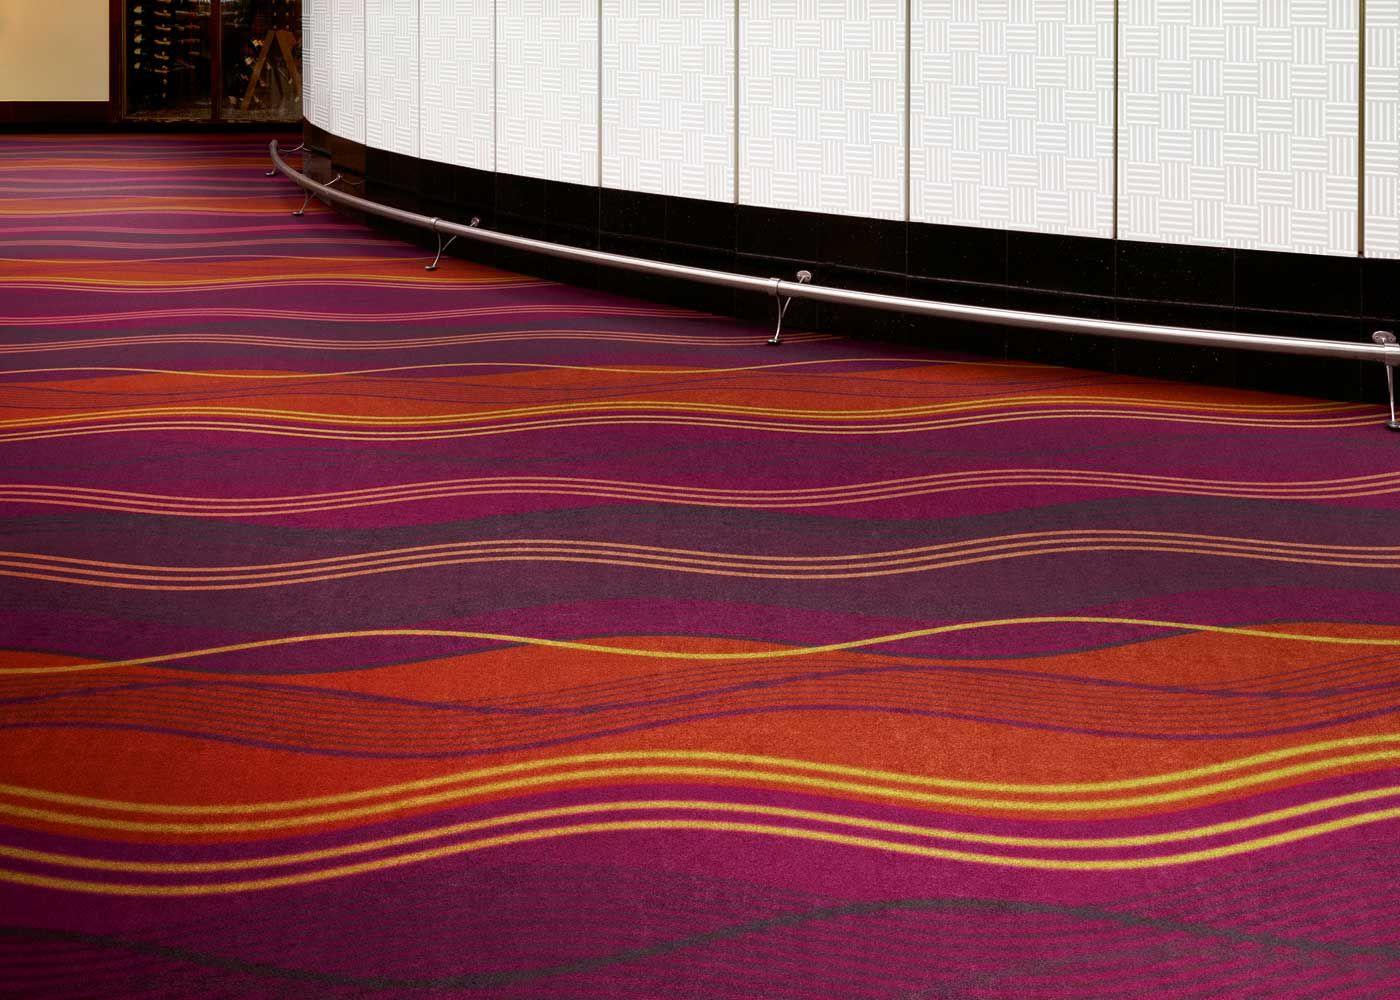 Muirgroup interiors glasgow scotland carpet tiles and flooring muirgroup interiors glasgow scotland carpet tiles and flooring dailygadgetfo Image collections